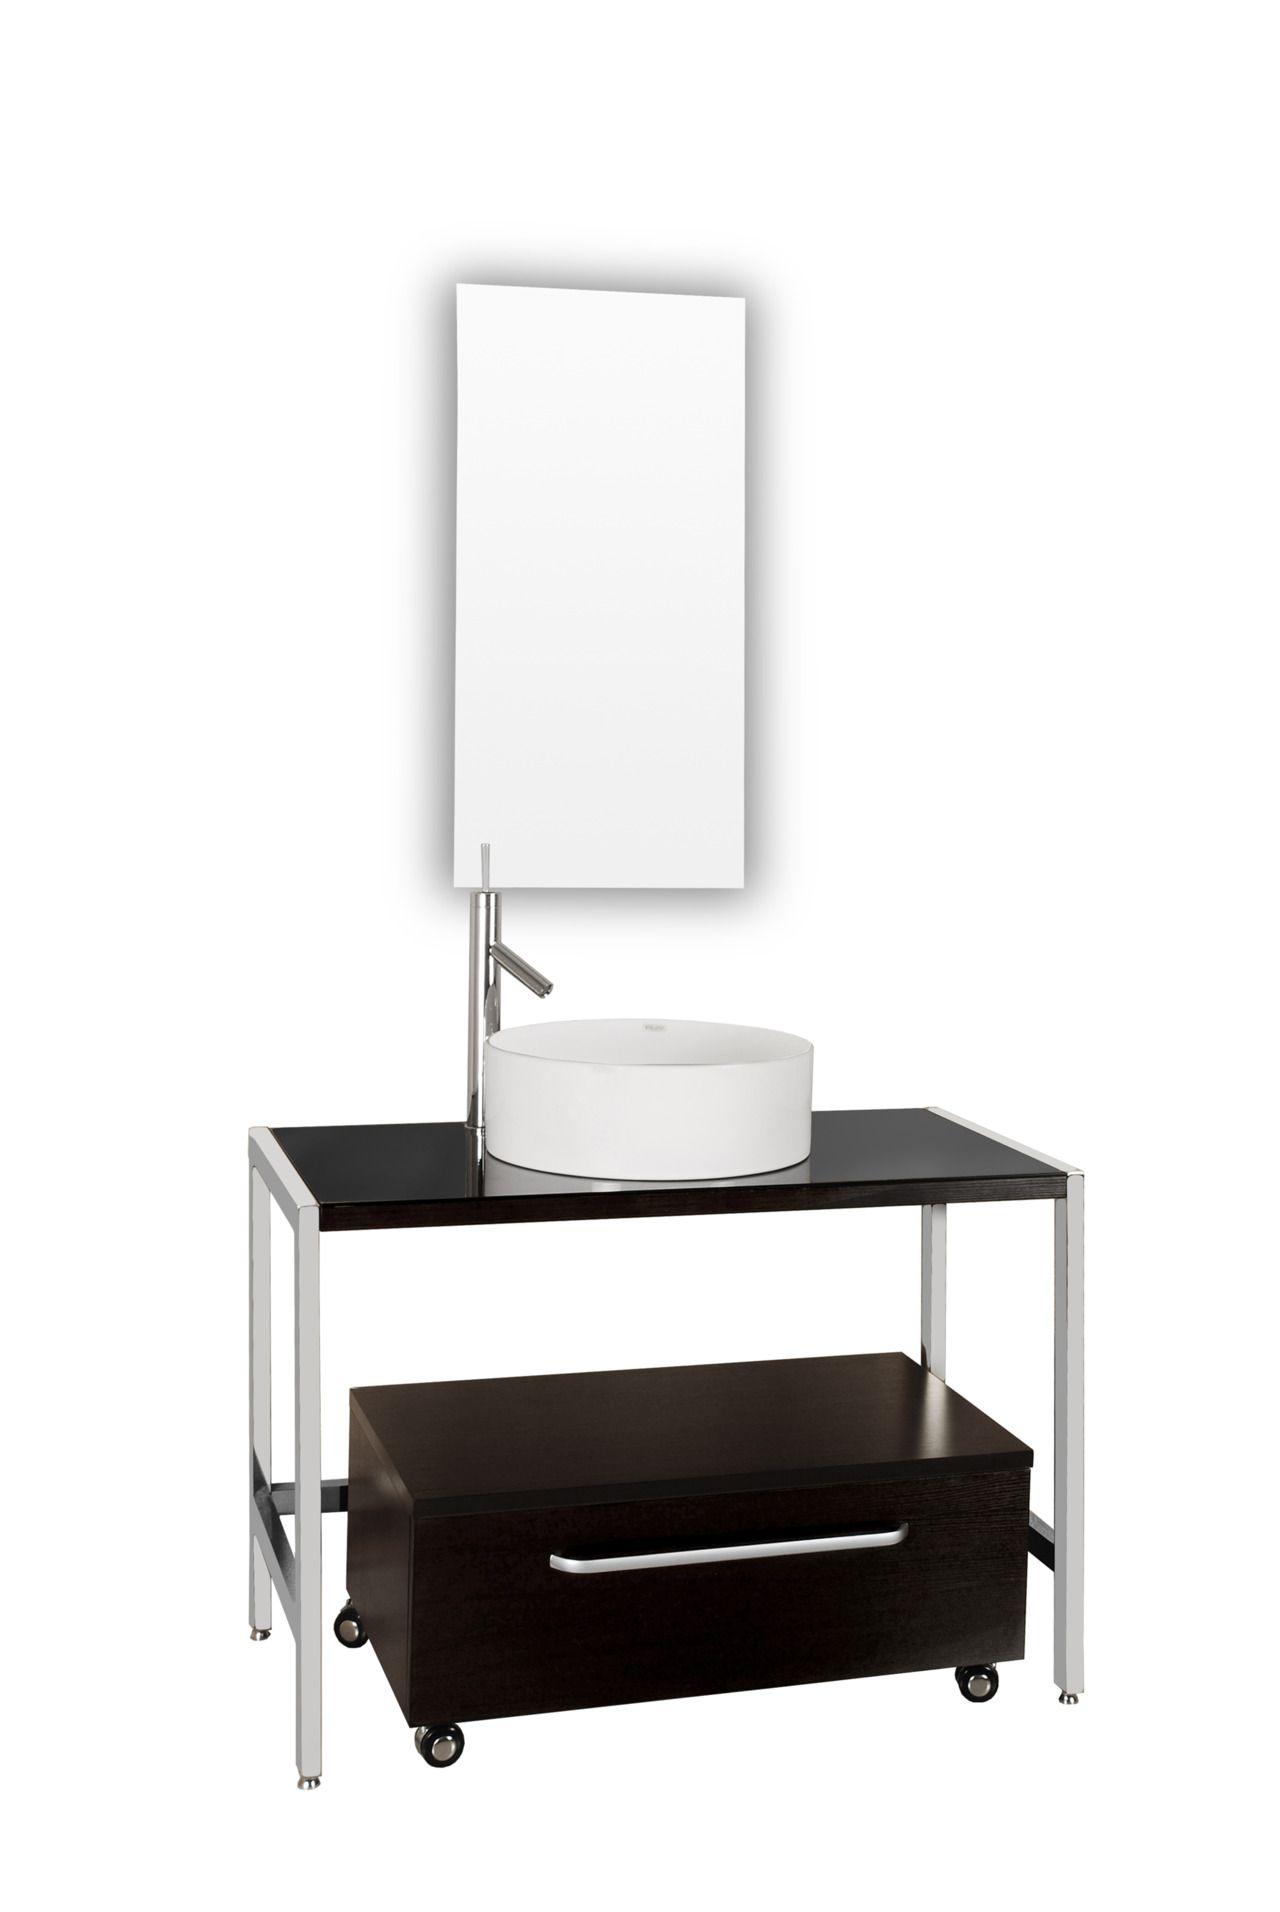 Muebles de bano wc obtenga ideas dise o de muebles para for Mueble encima wc